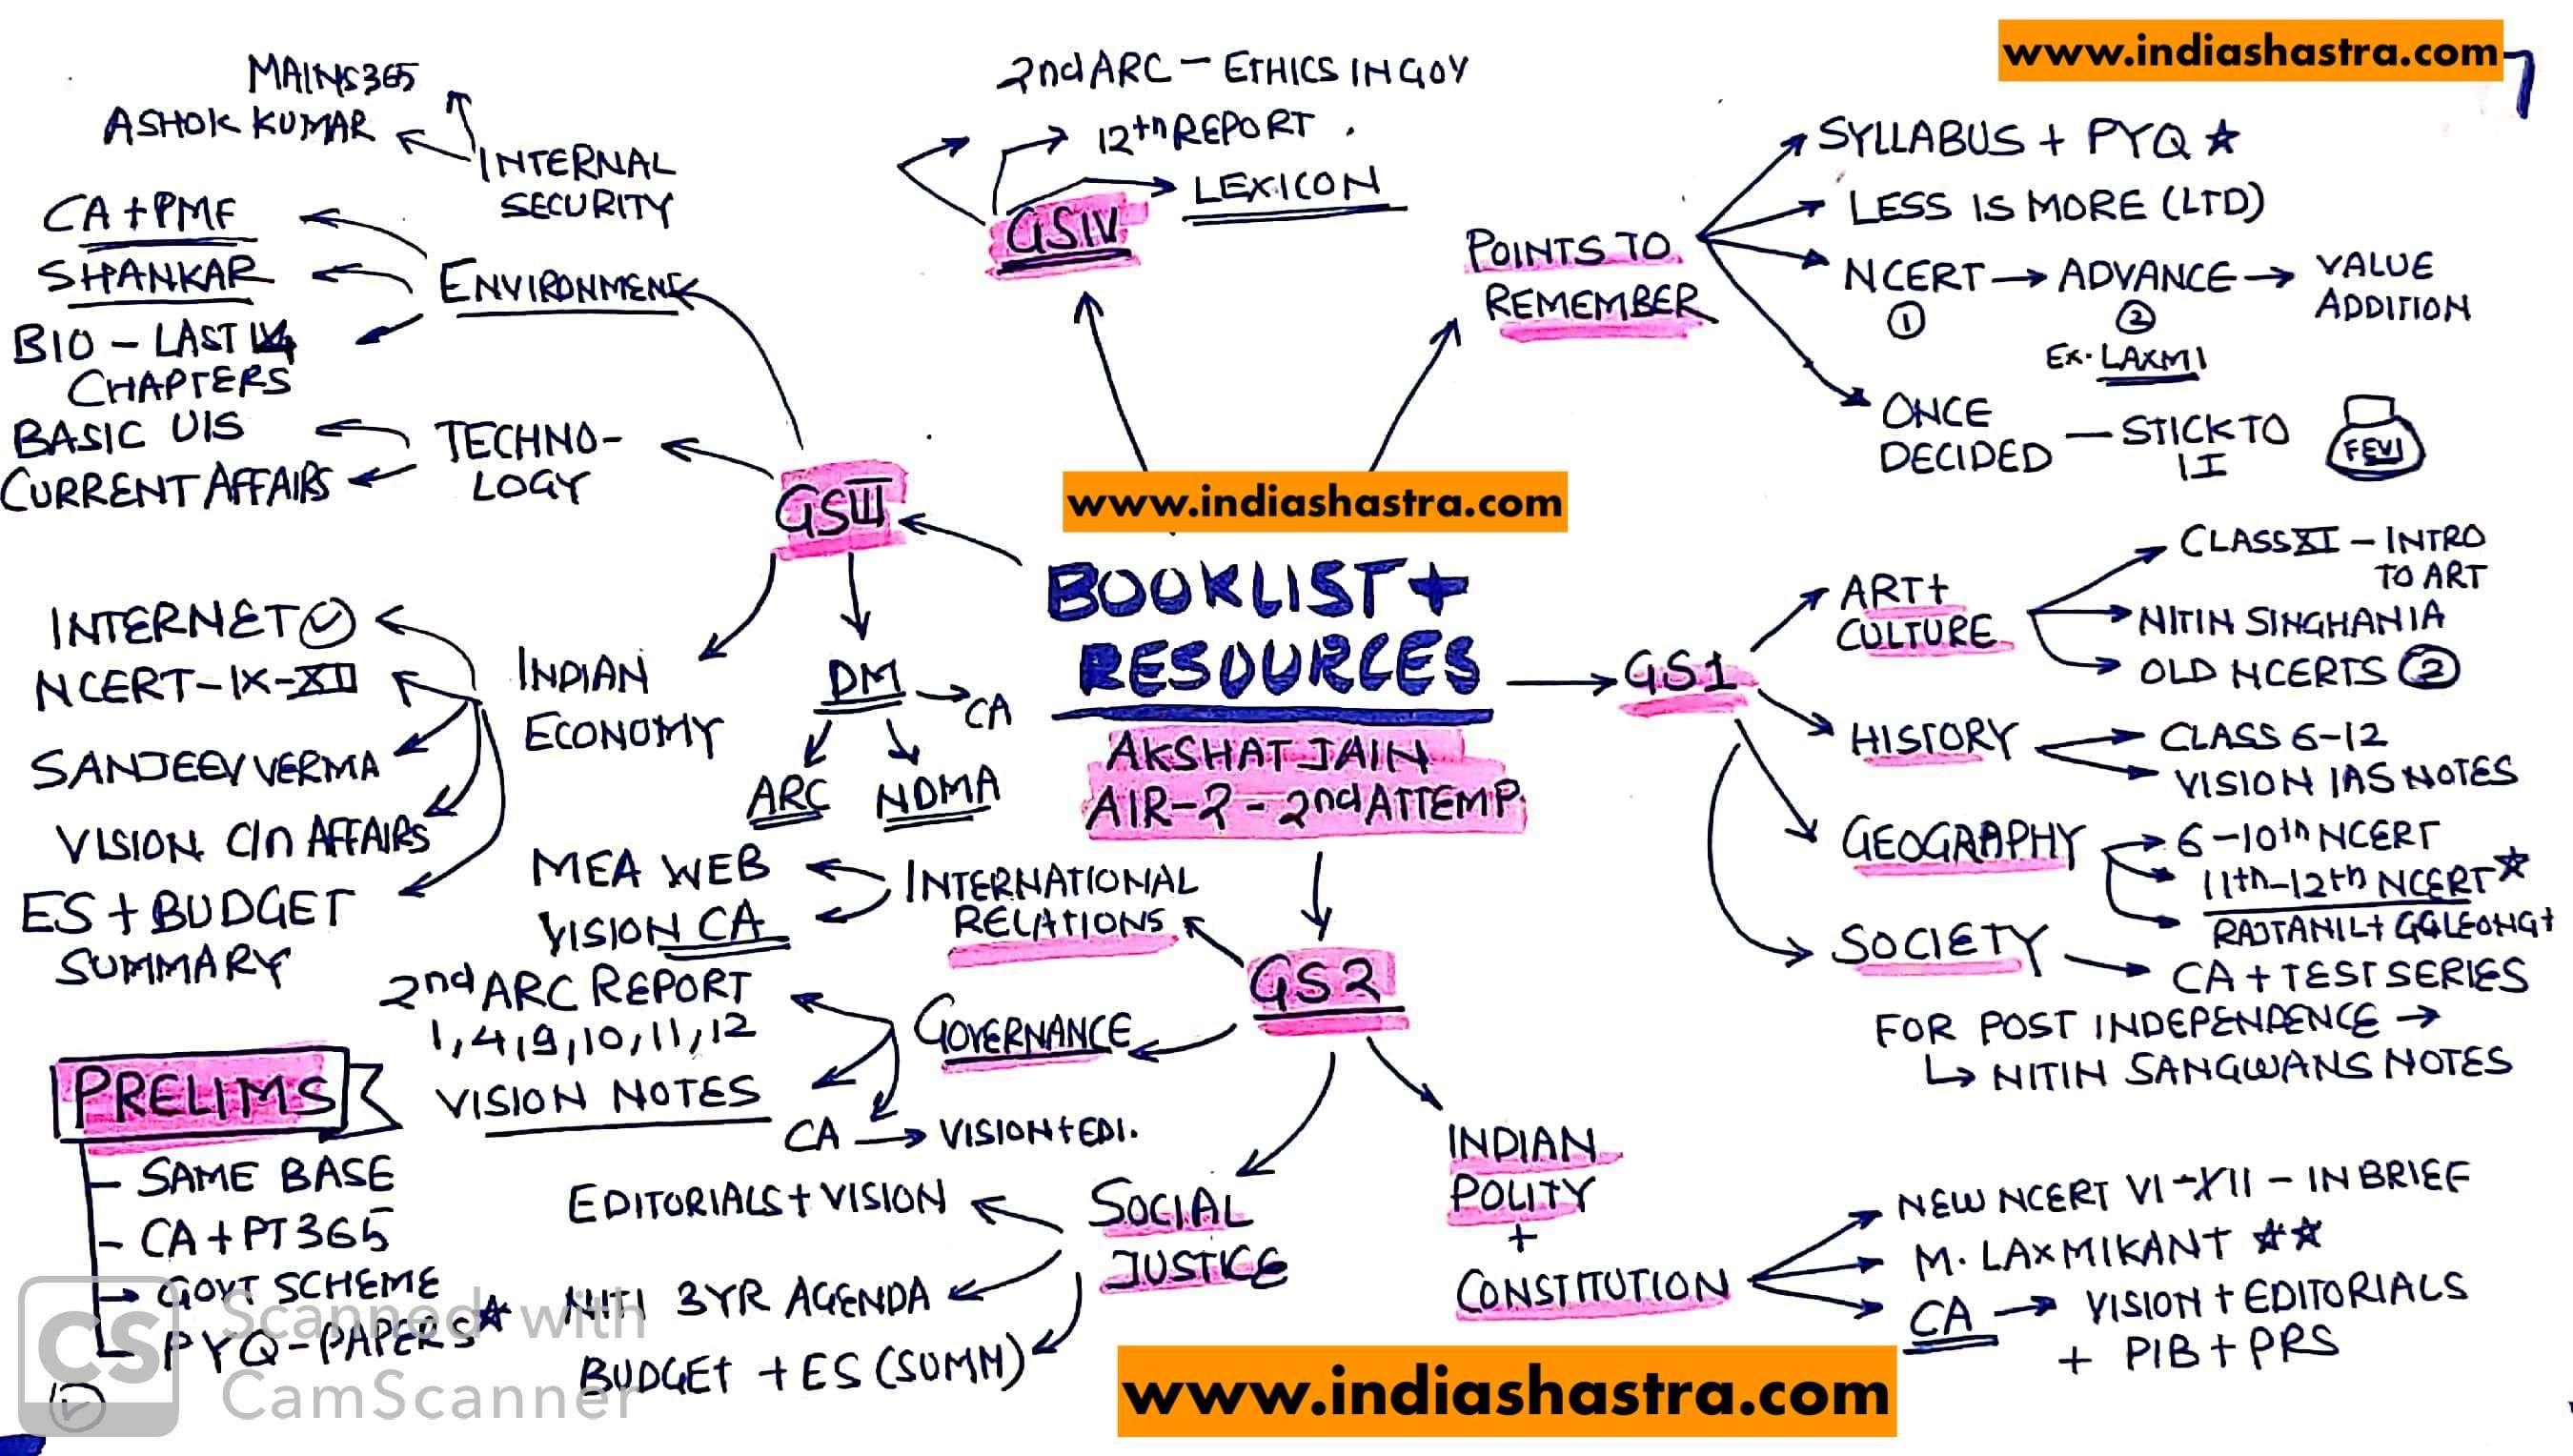 Resource Booklist For Upsc Akshat Jain Air 2 Cse 2018 Book List Middle School Supplie Reading Beginners Essay Writing